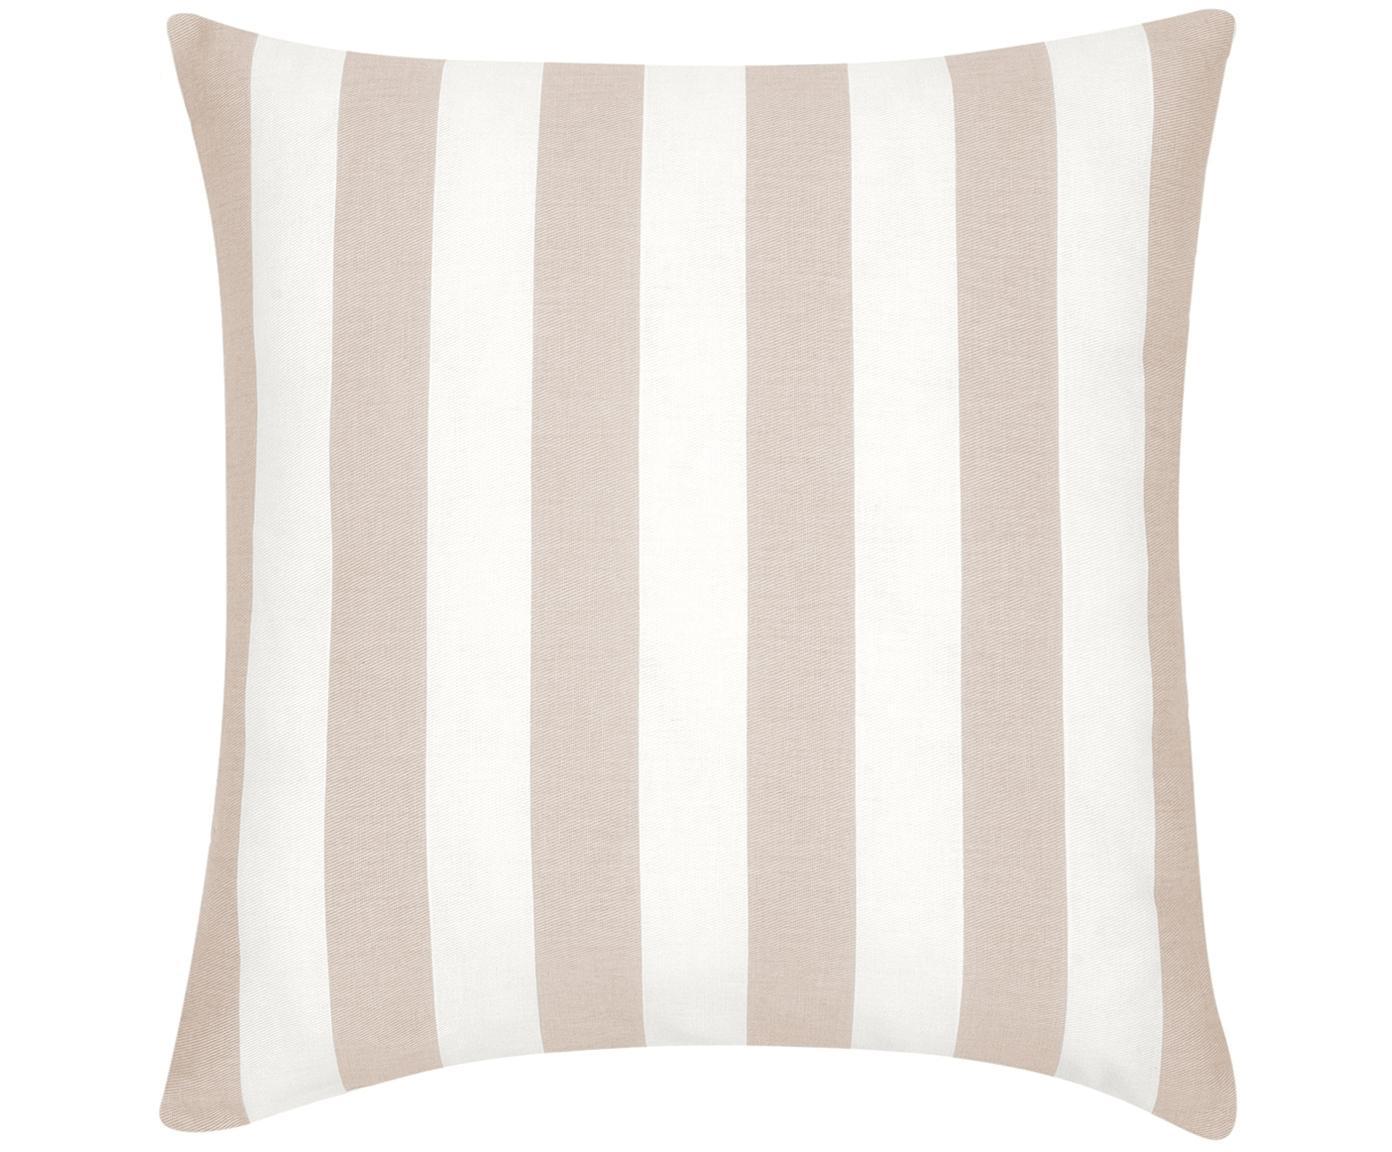 Kussenhoes Timon, 100% katoen, Taupe, wit, 45 x 45 cm